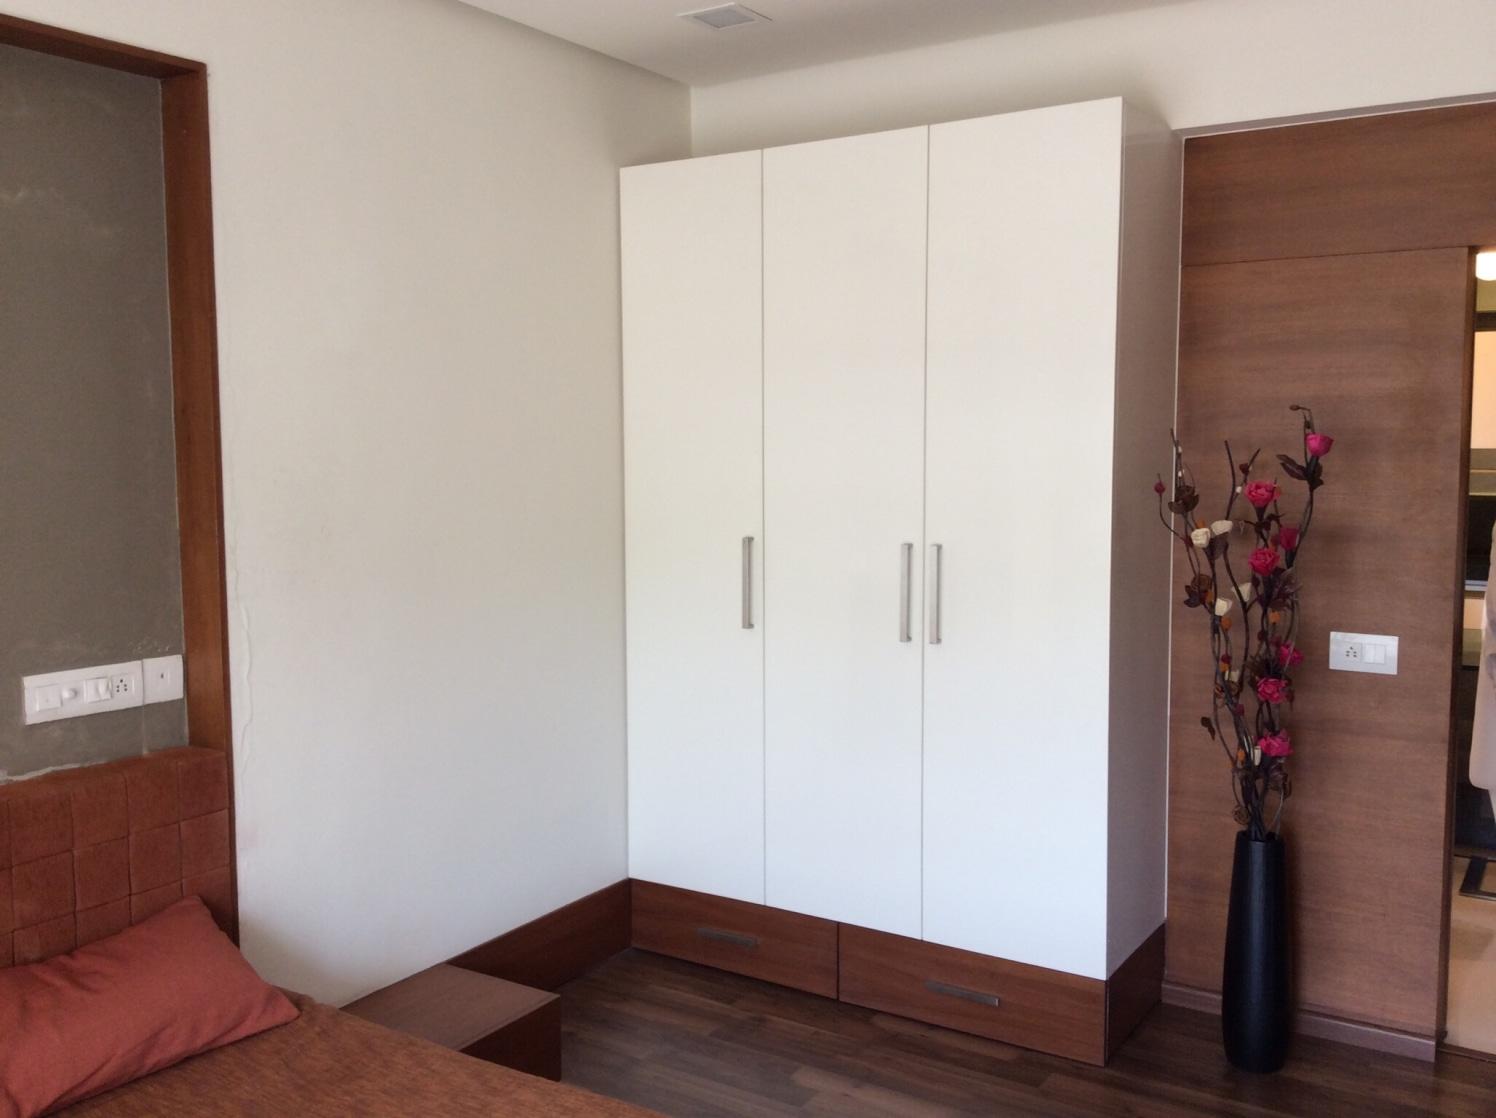 Bedroom with wooden flooring and white almirah by Vatsal Hadvani Bedroom Contemporary | Interior Design Photos & Ideas